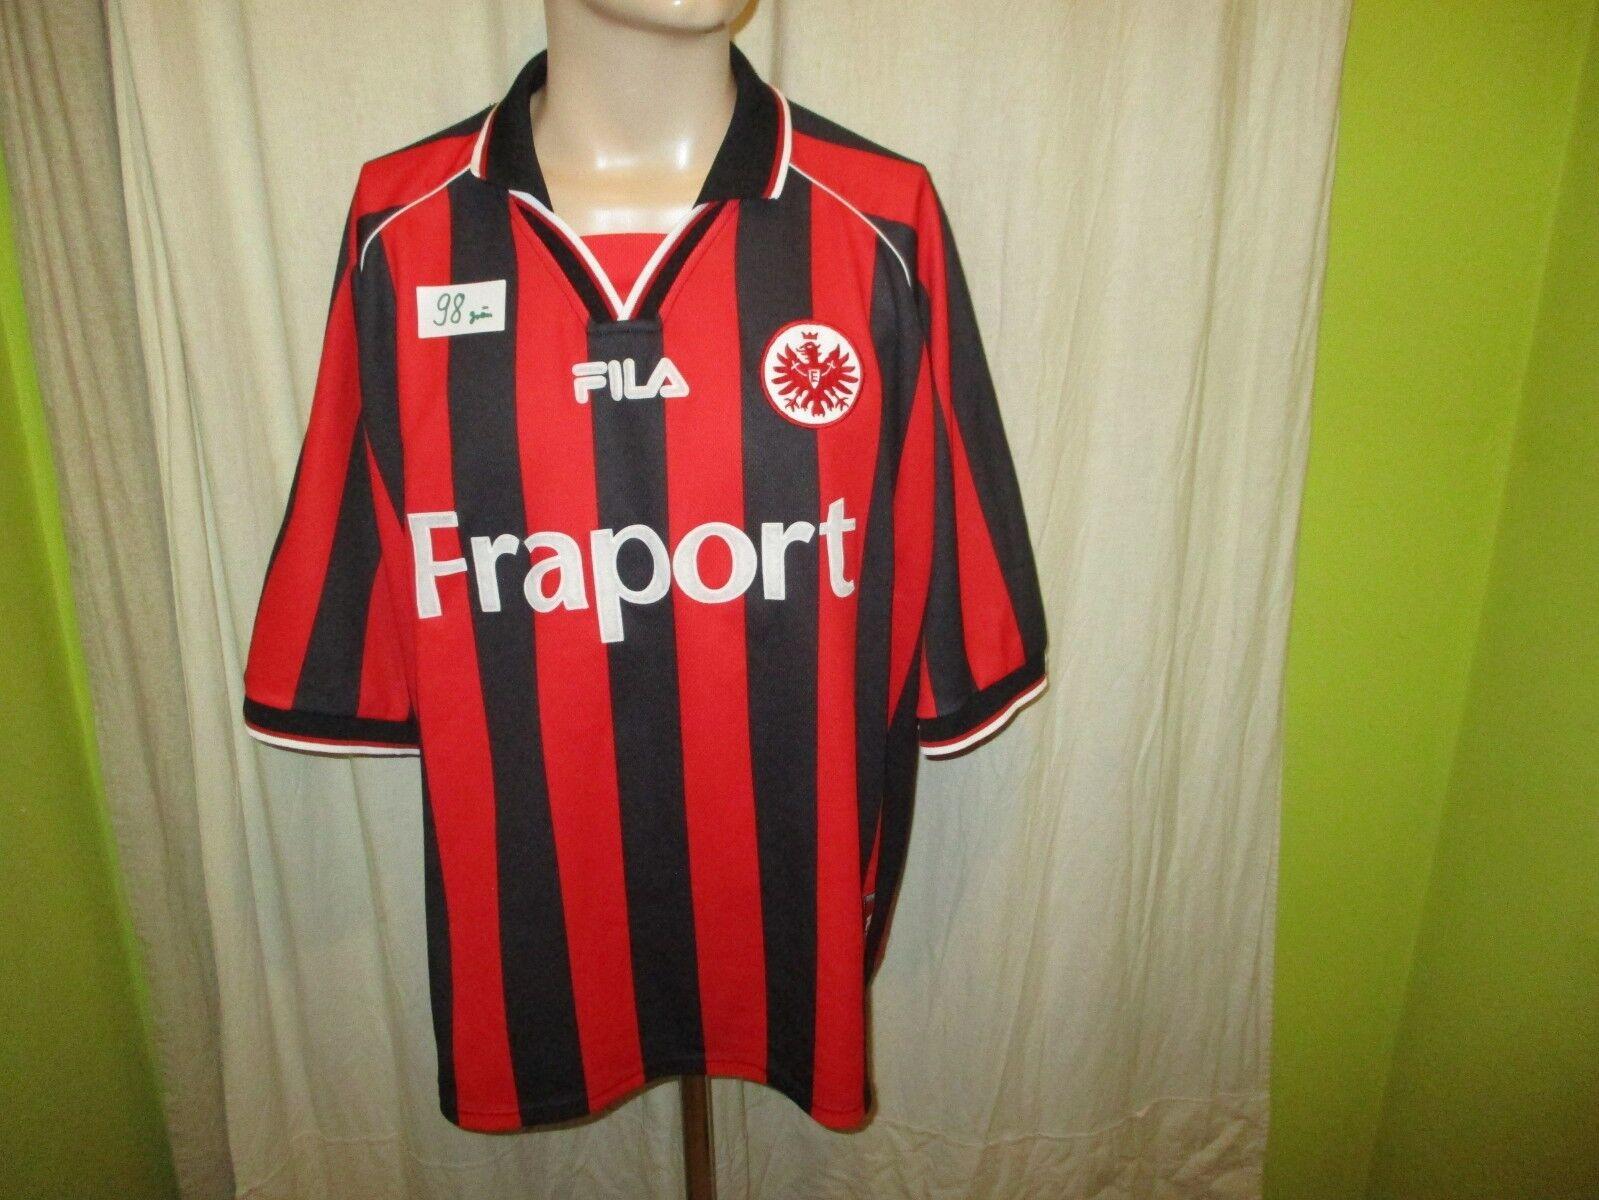 Eintracht Frankfurt Fila Heim Trikot Aufstieg Saison 2001 02  FRAPORT  Gr.XXL